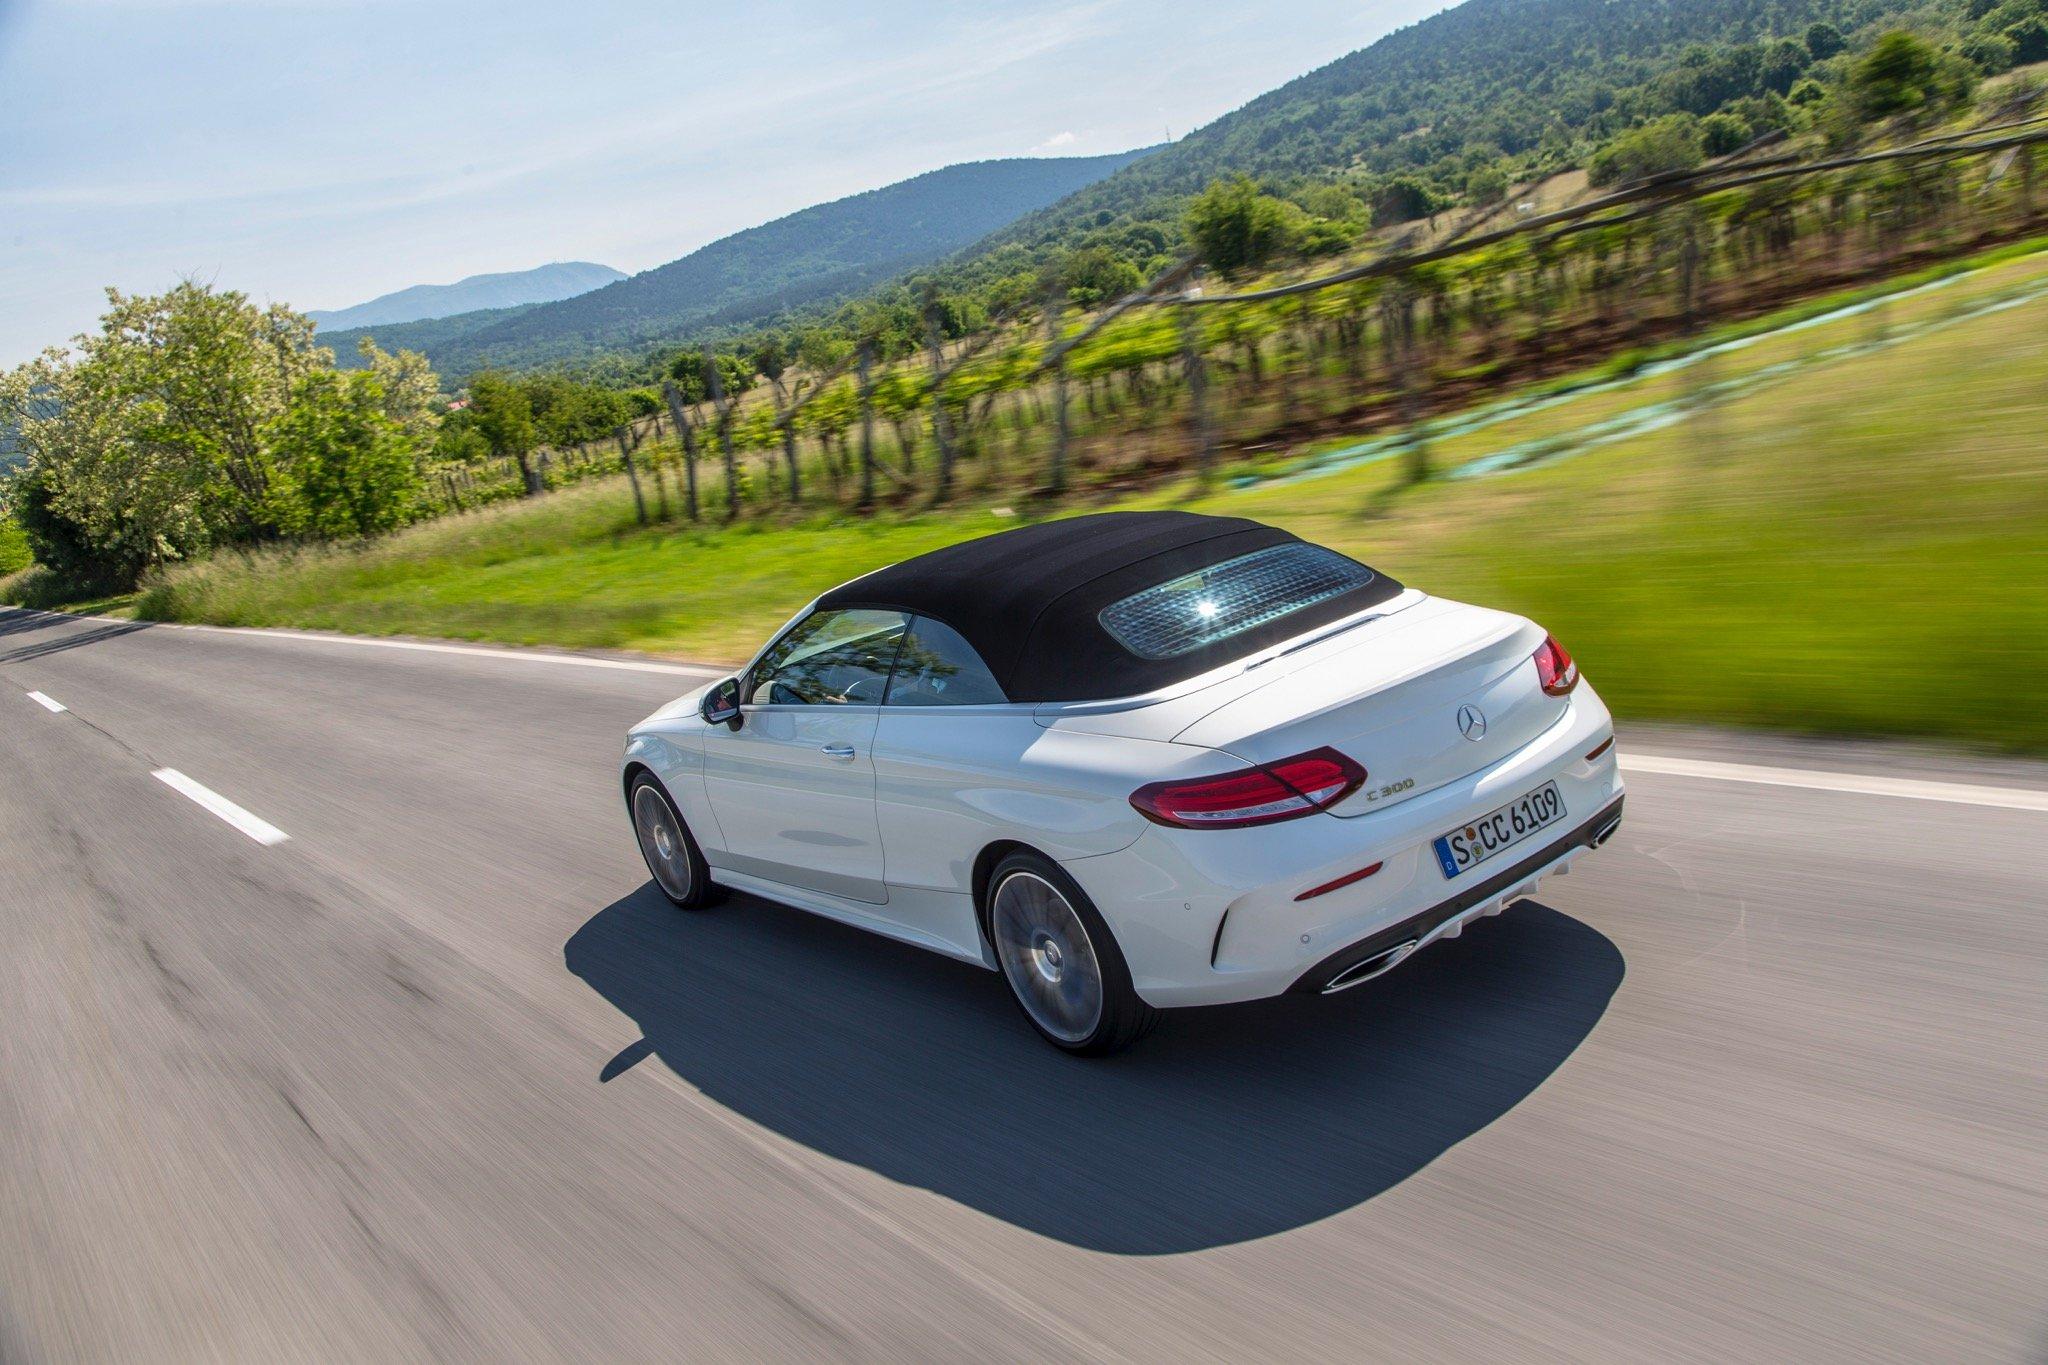 Fantastic 2017 MercedesBenz CClass Cabriolet Review  CarAdvice